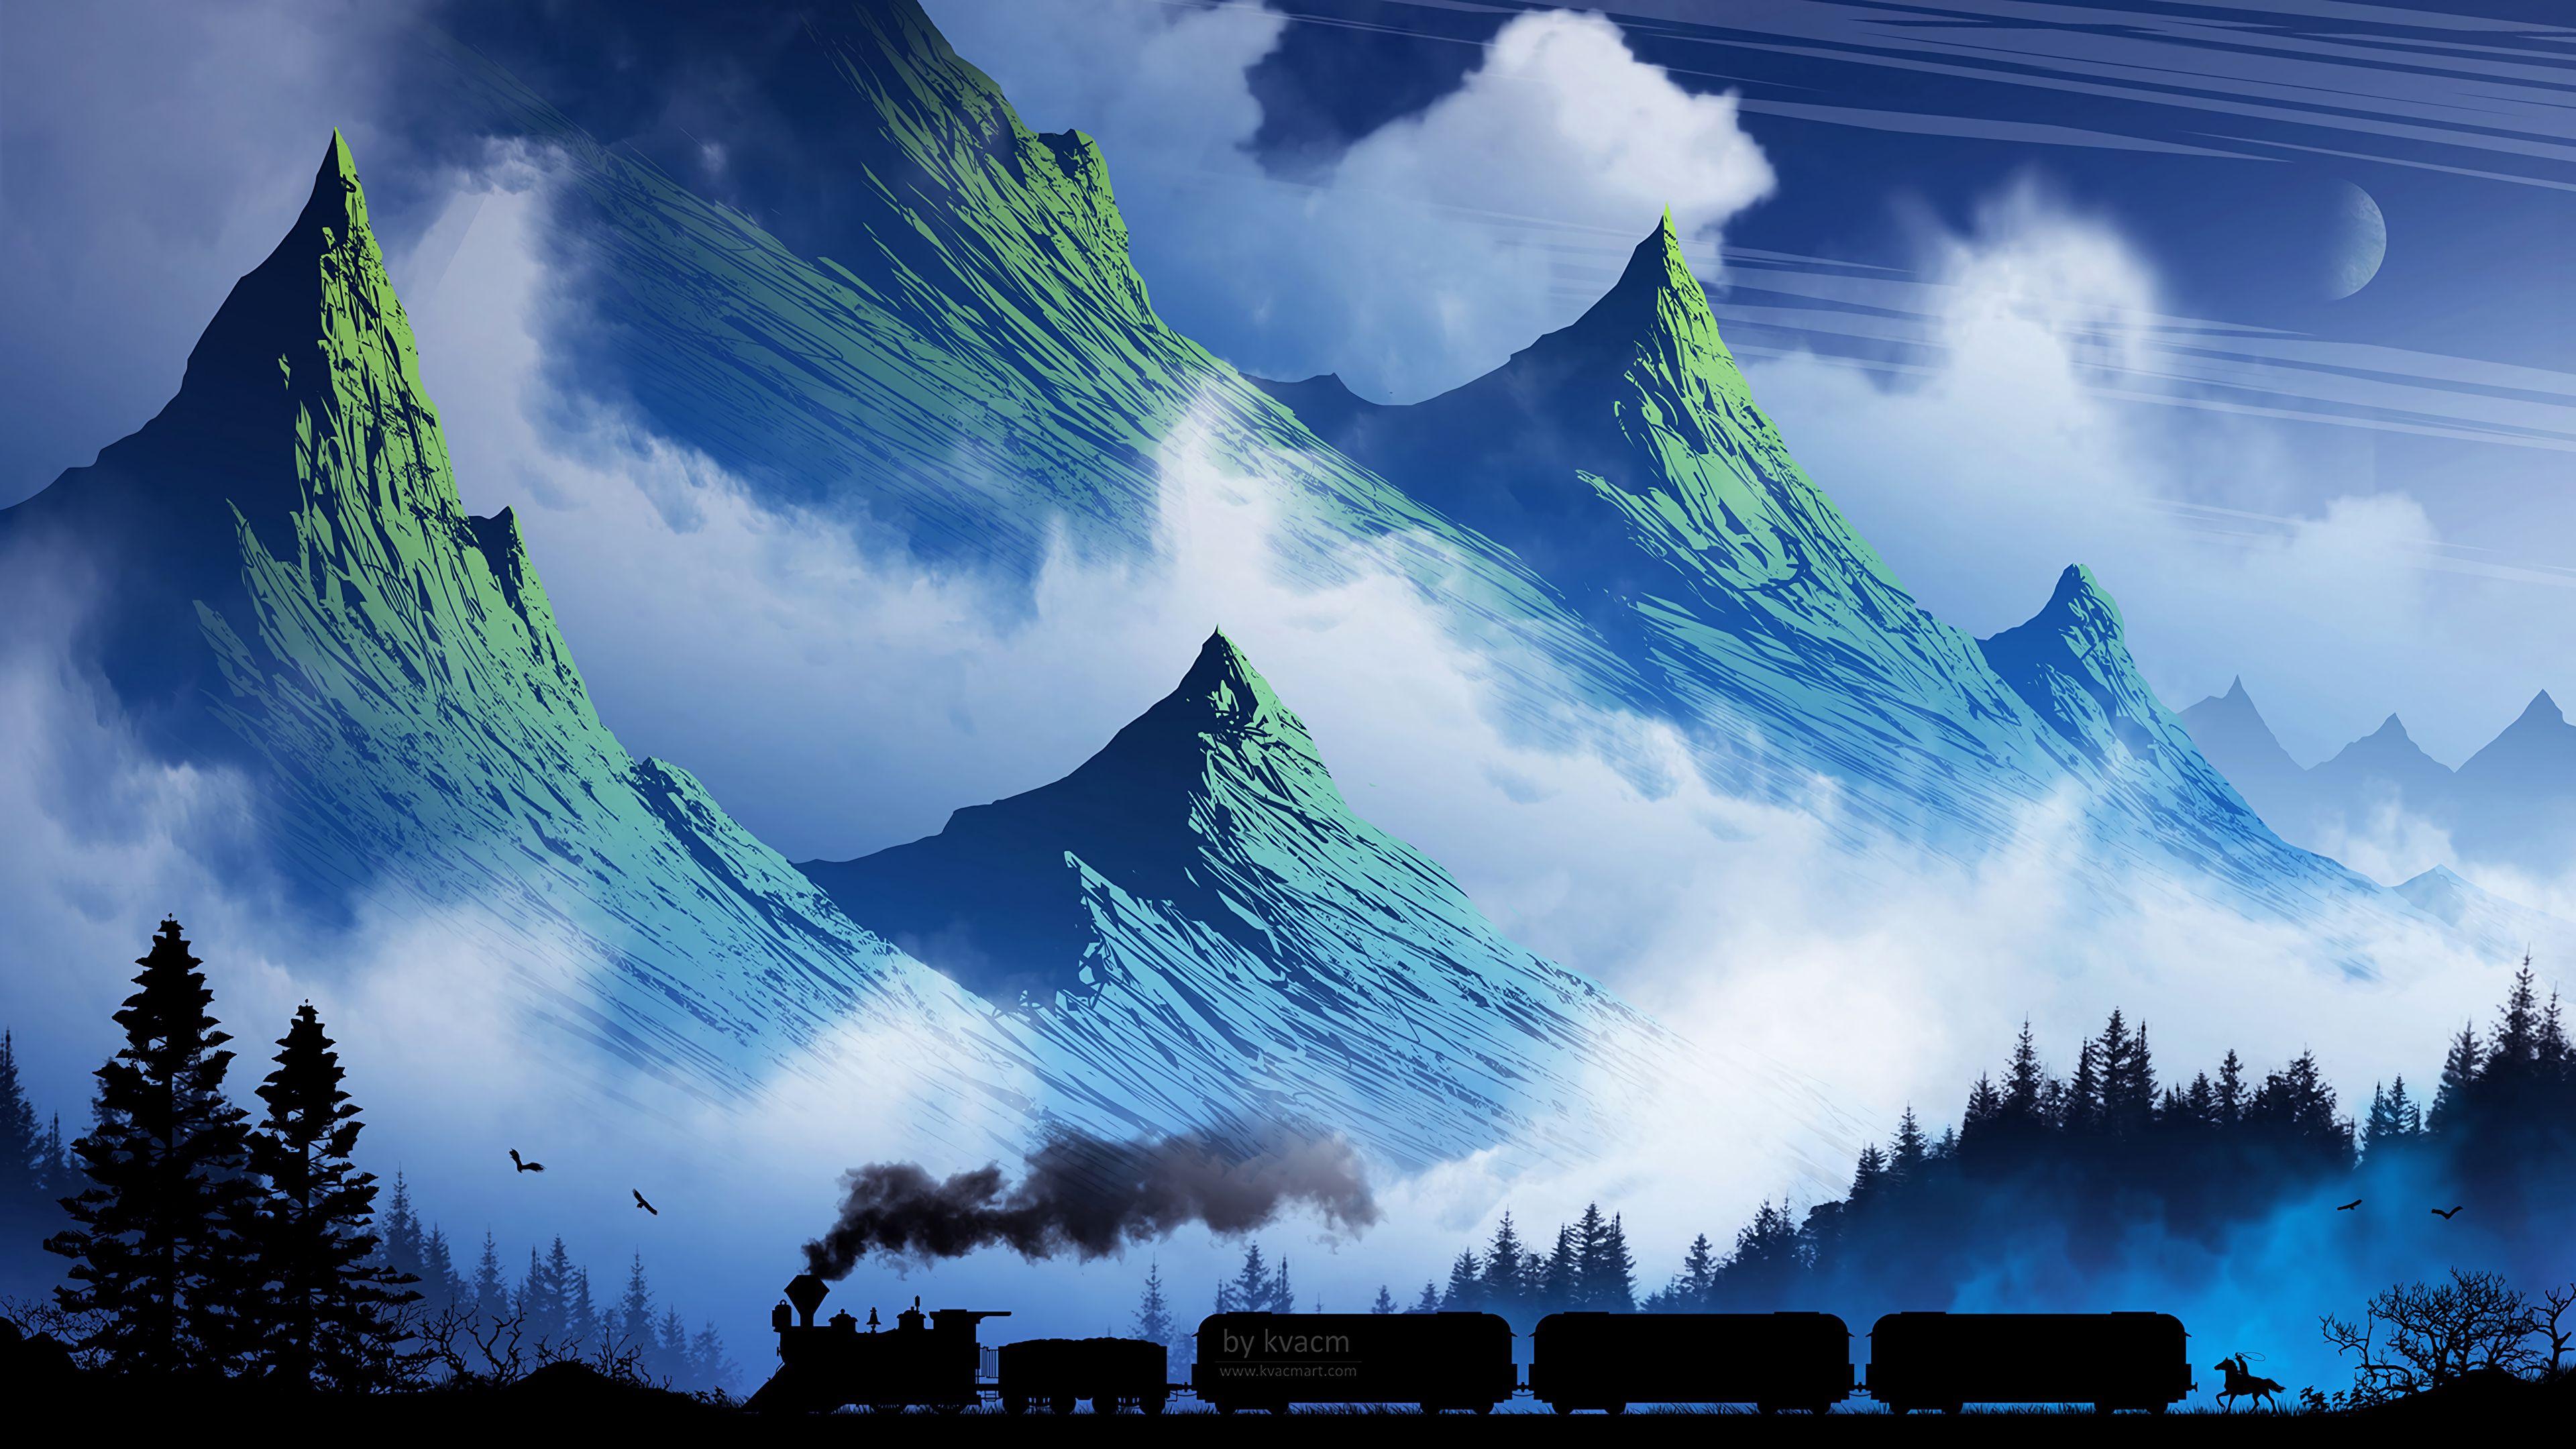 3840x2160 Wallpaper train, mountains, art, fog, smoke